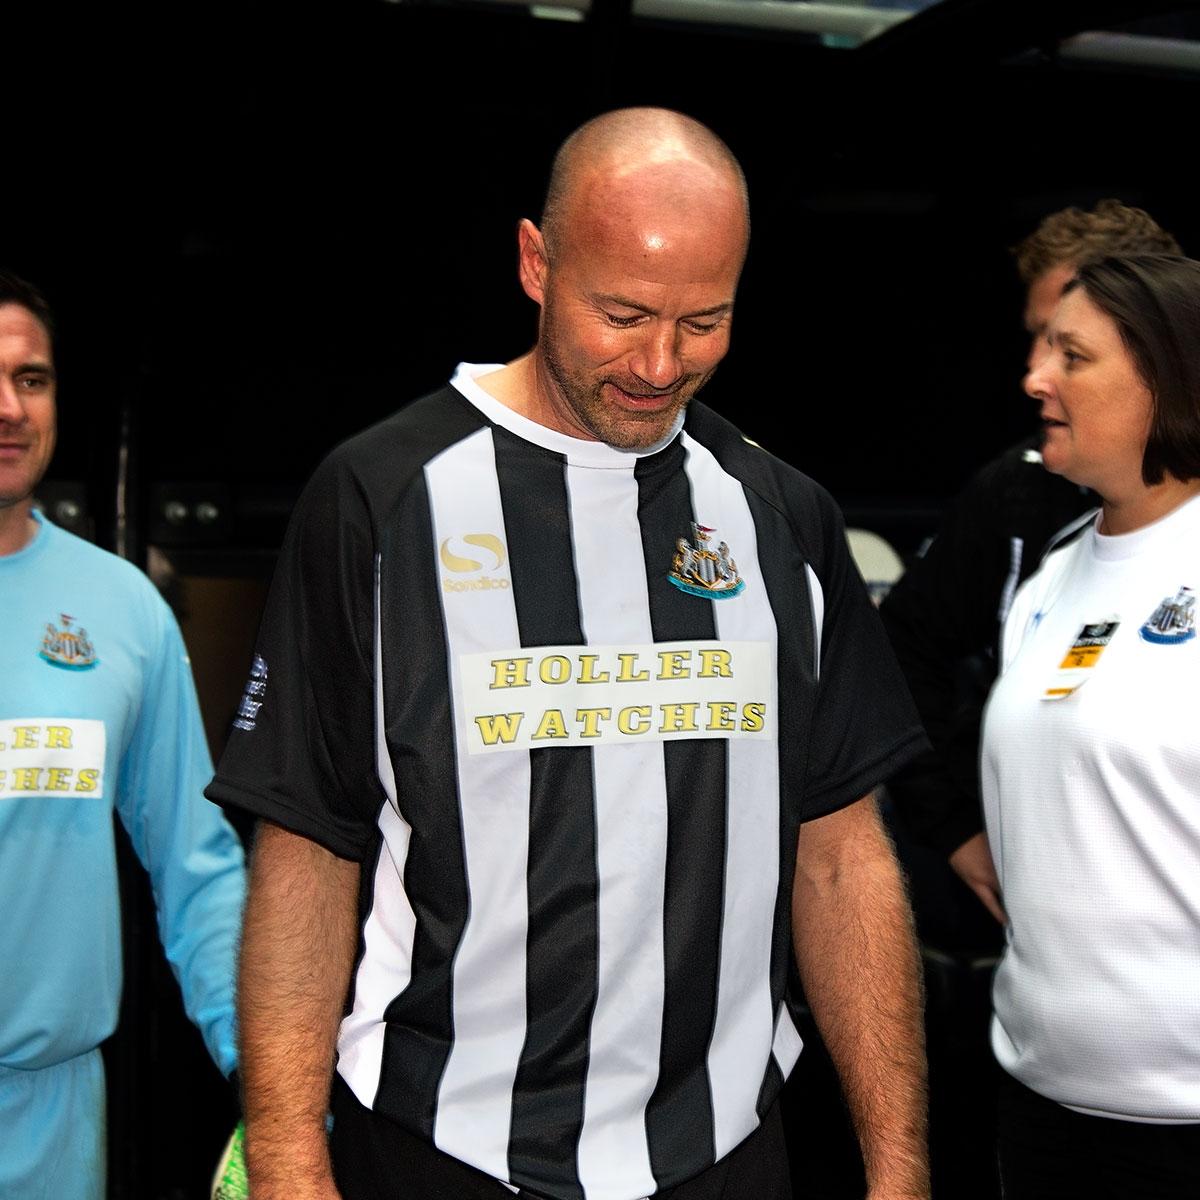 Newcastle United NUFC Home Shirt / Steve Harper Testimonial - LIMITED EDITION